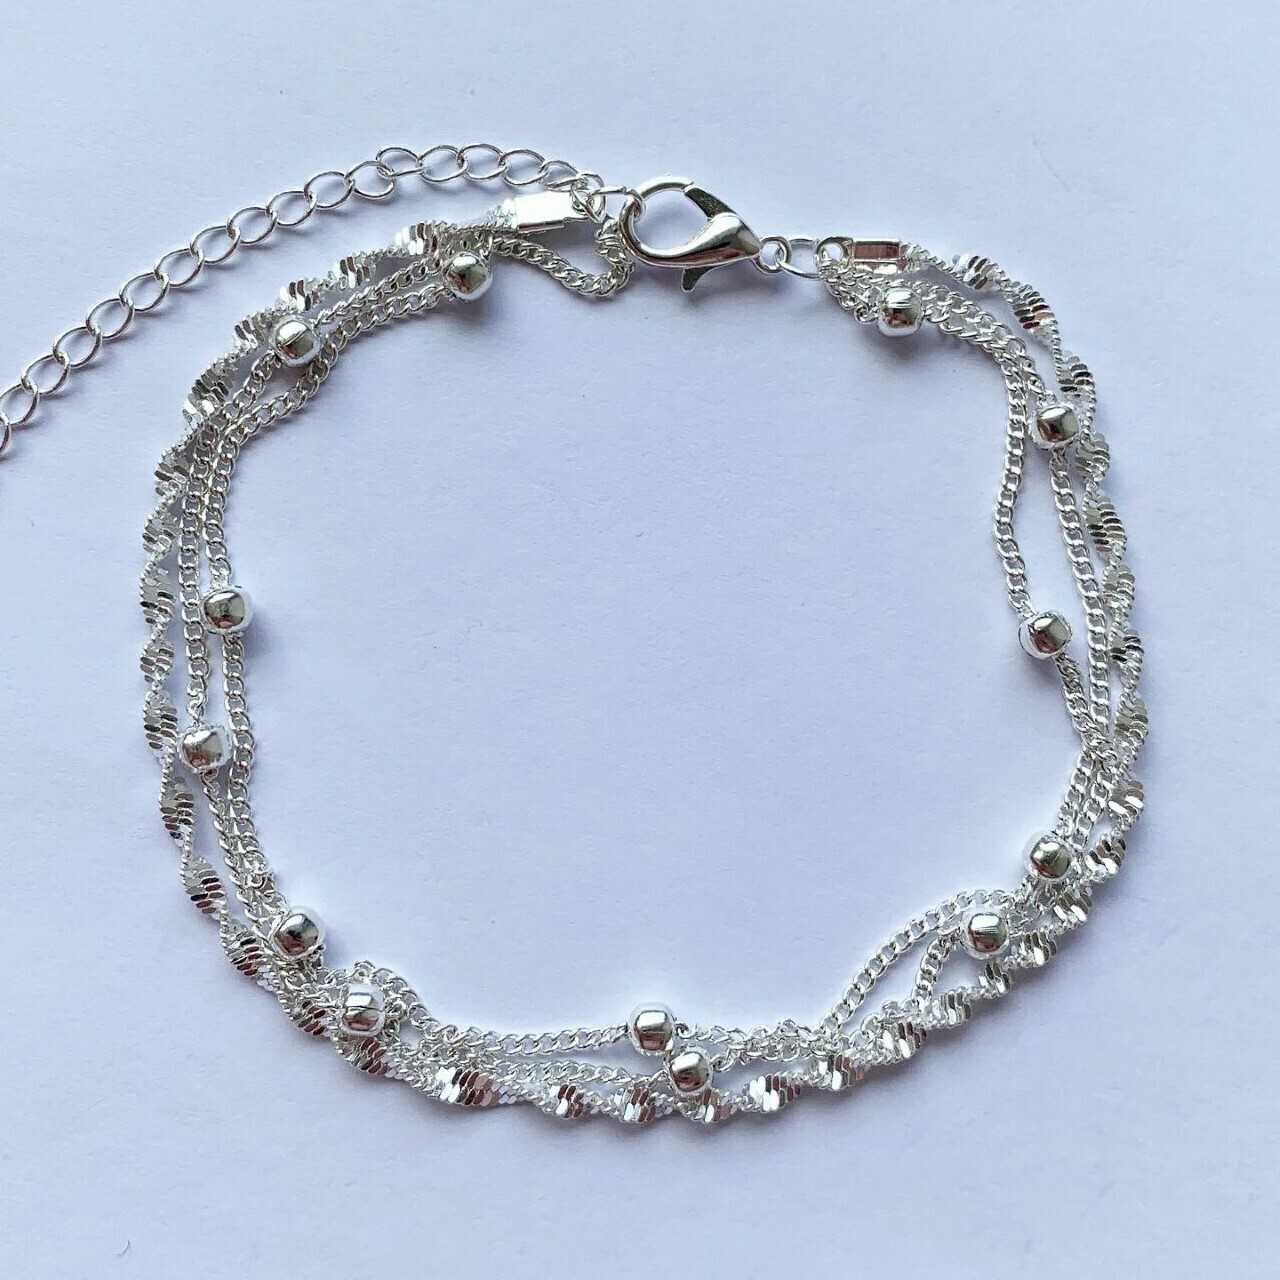 Enkelbandje met tiny beads en gedraaid 925 sterling zilver